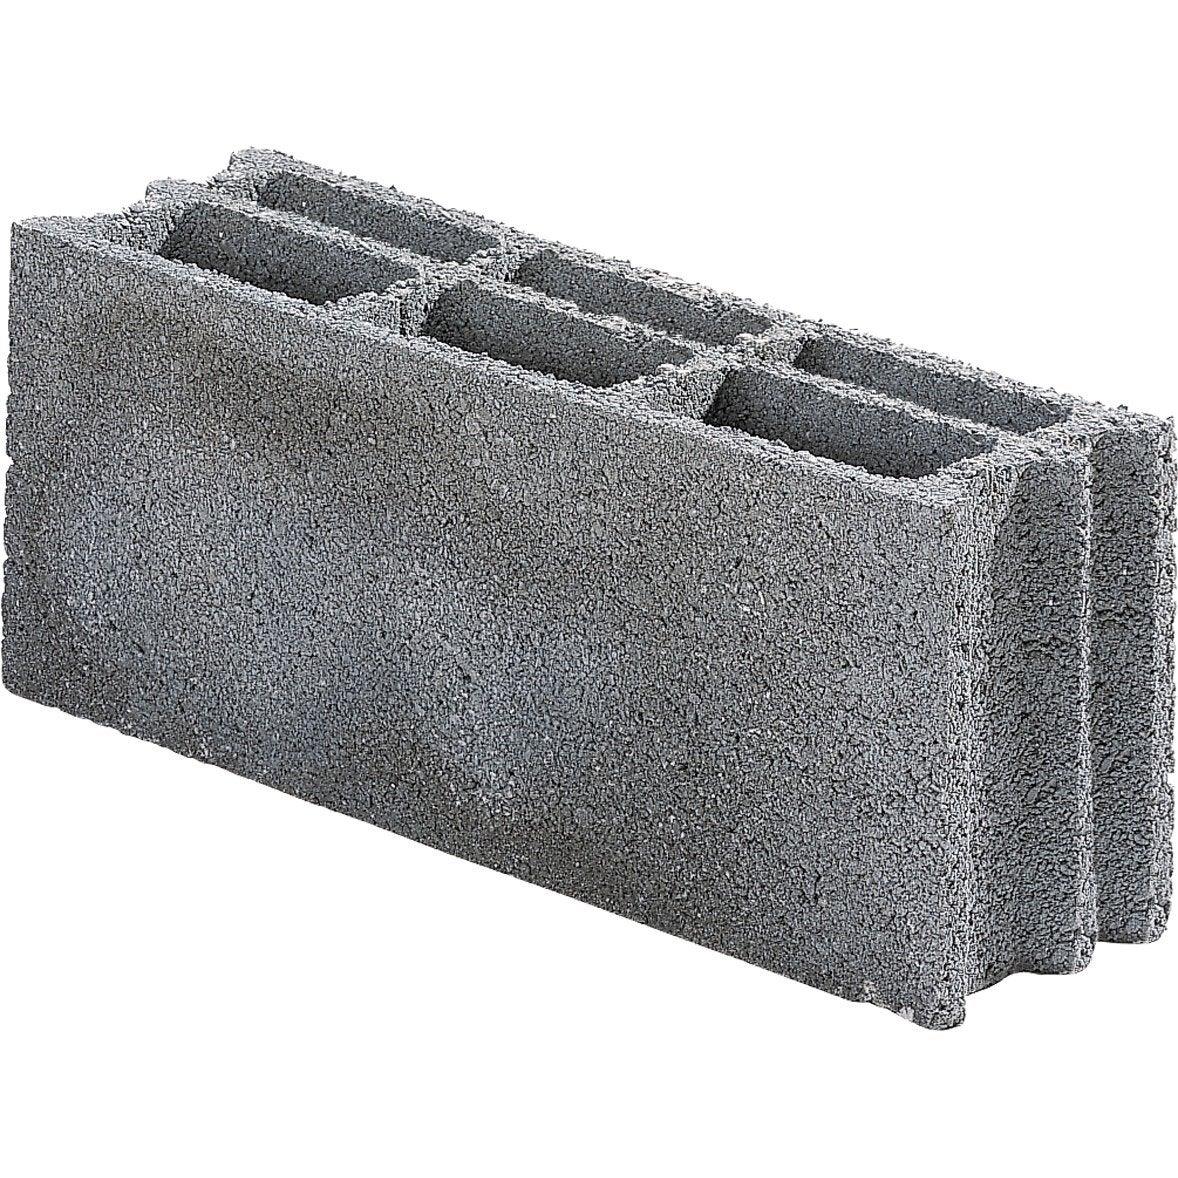 parpaing bancher 25x25x50 cm leroy merlin. Black Bedroom Furniture Sets. Home Design Ideas